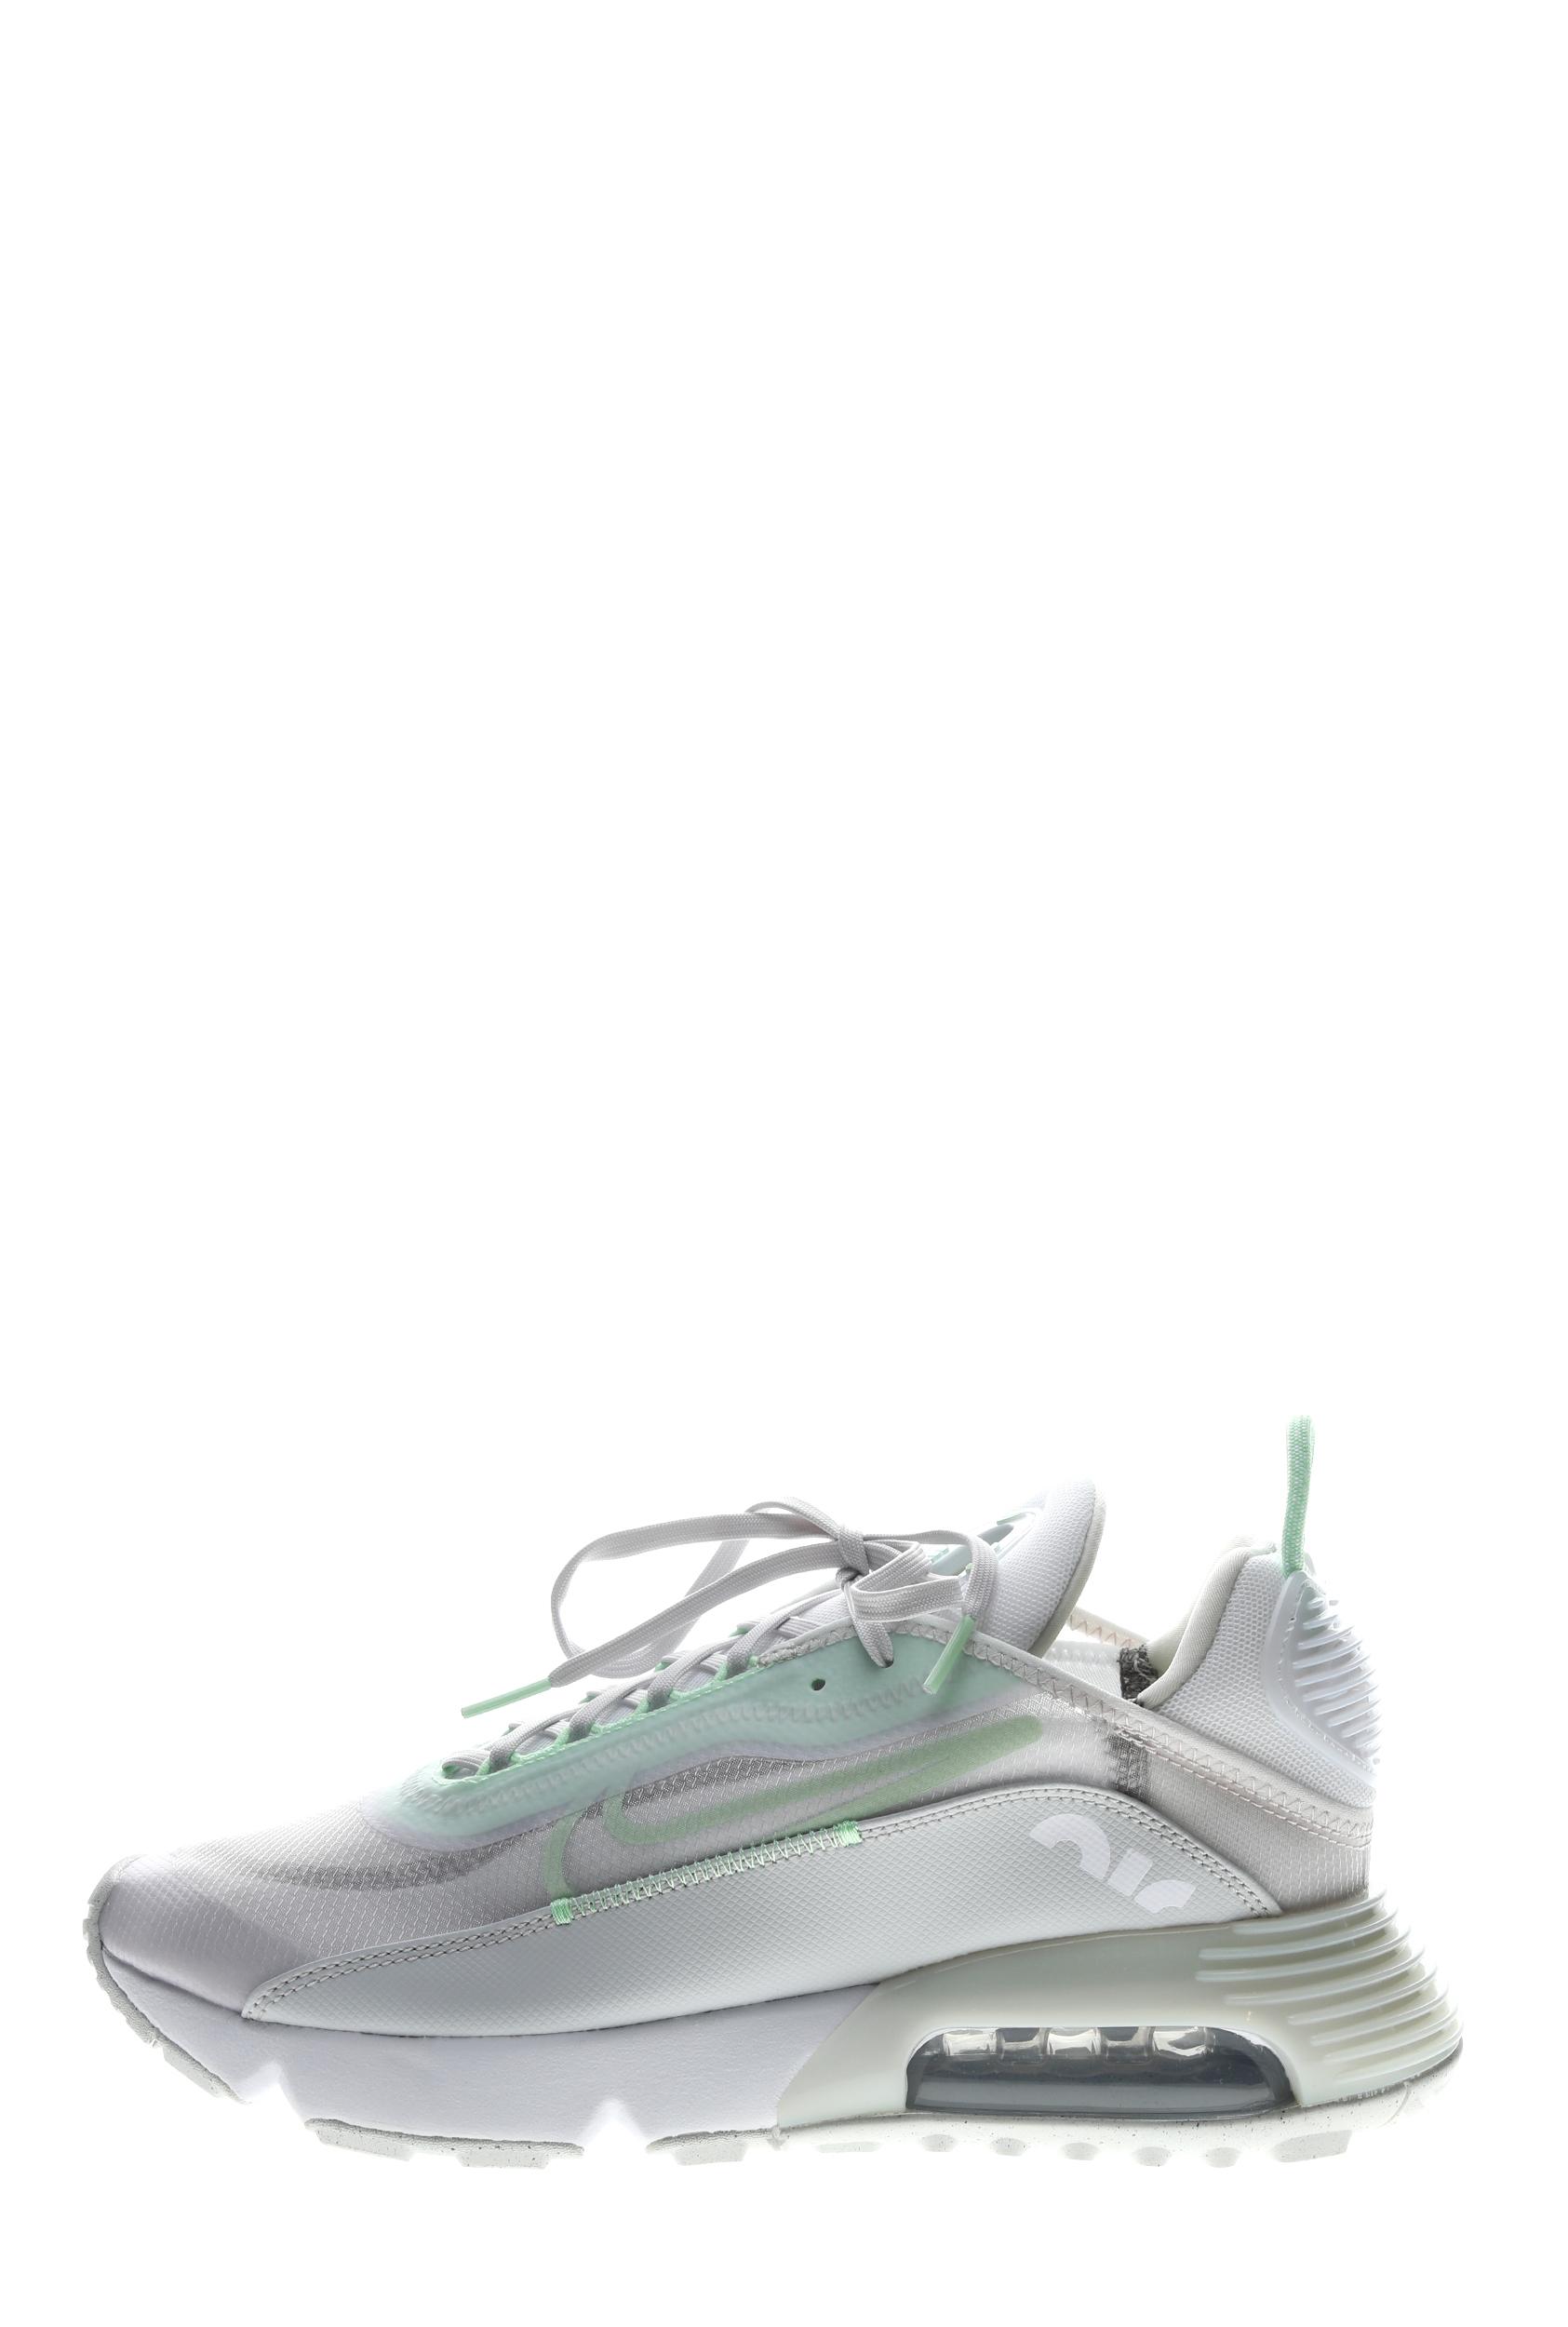 NIKE – Ανδρικό παπούτσι NIKE AIR MAX 2090 λευκό